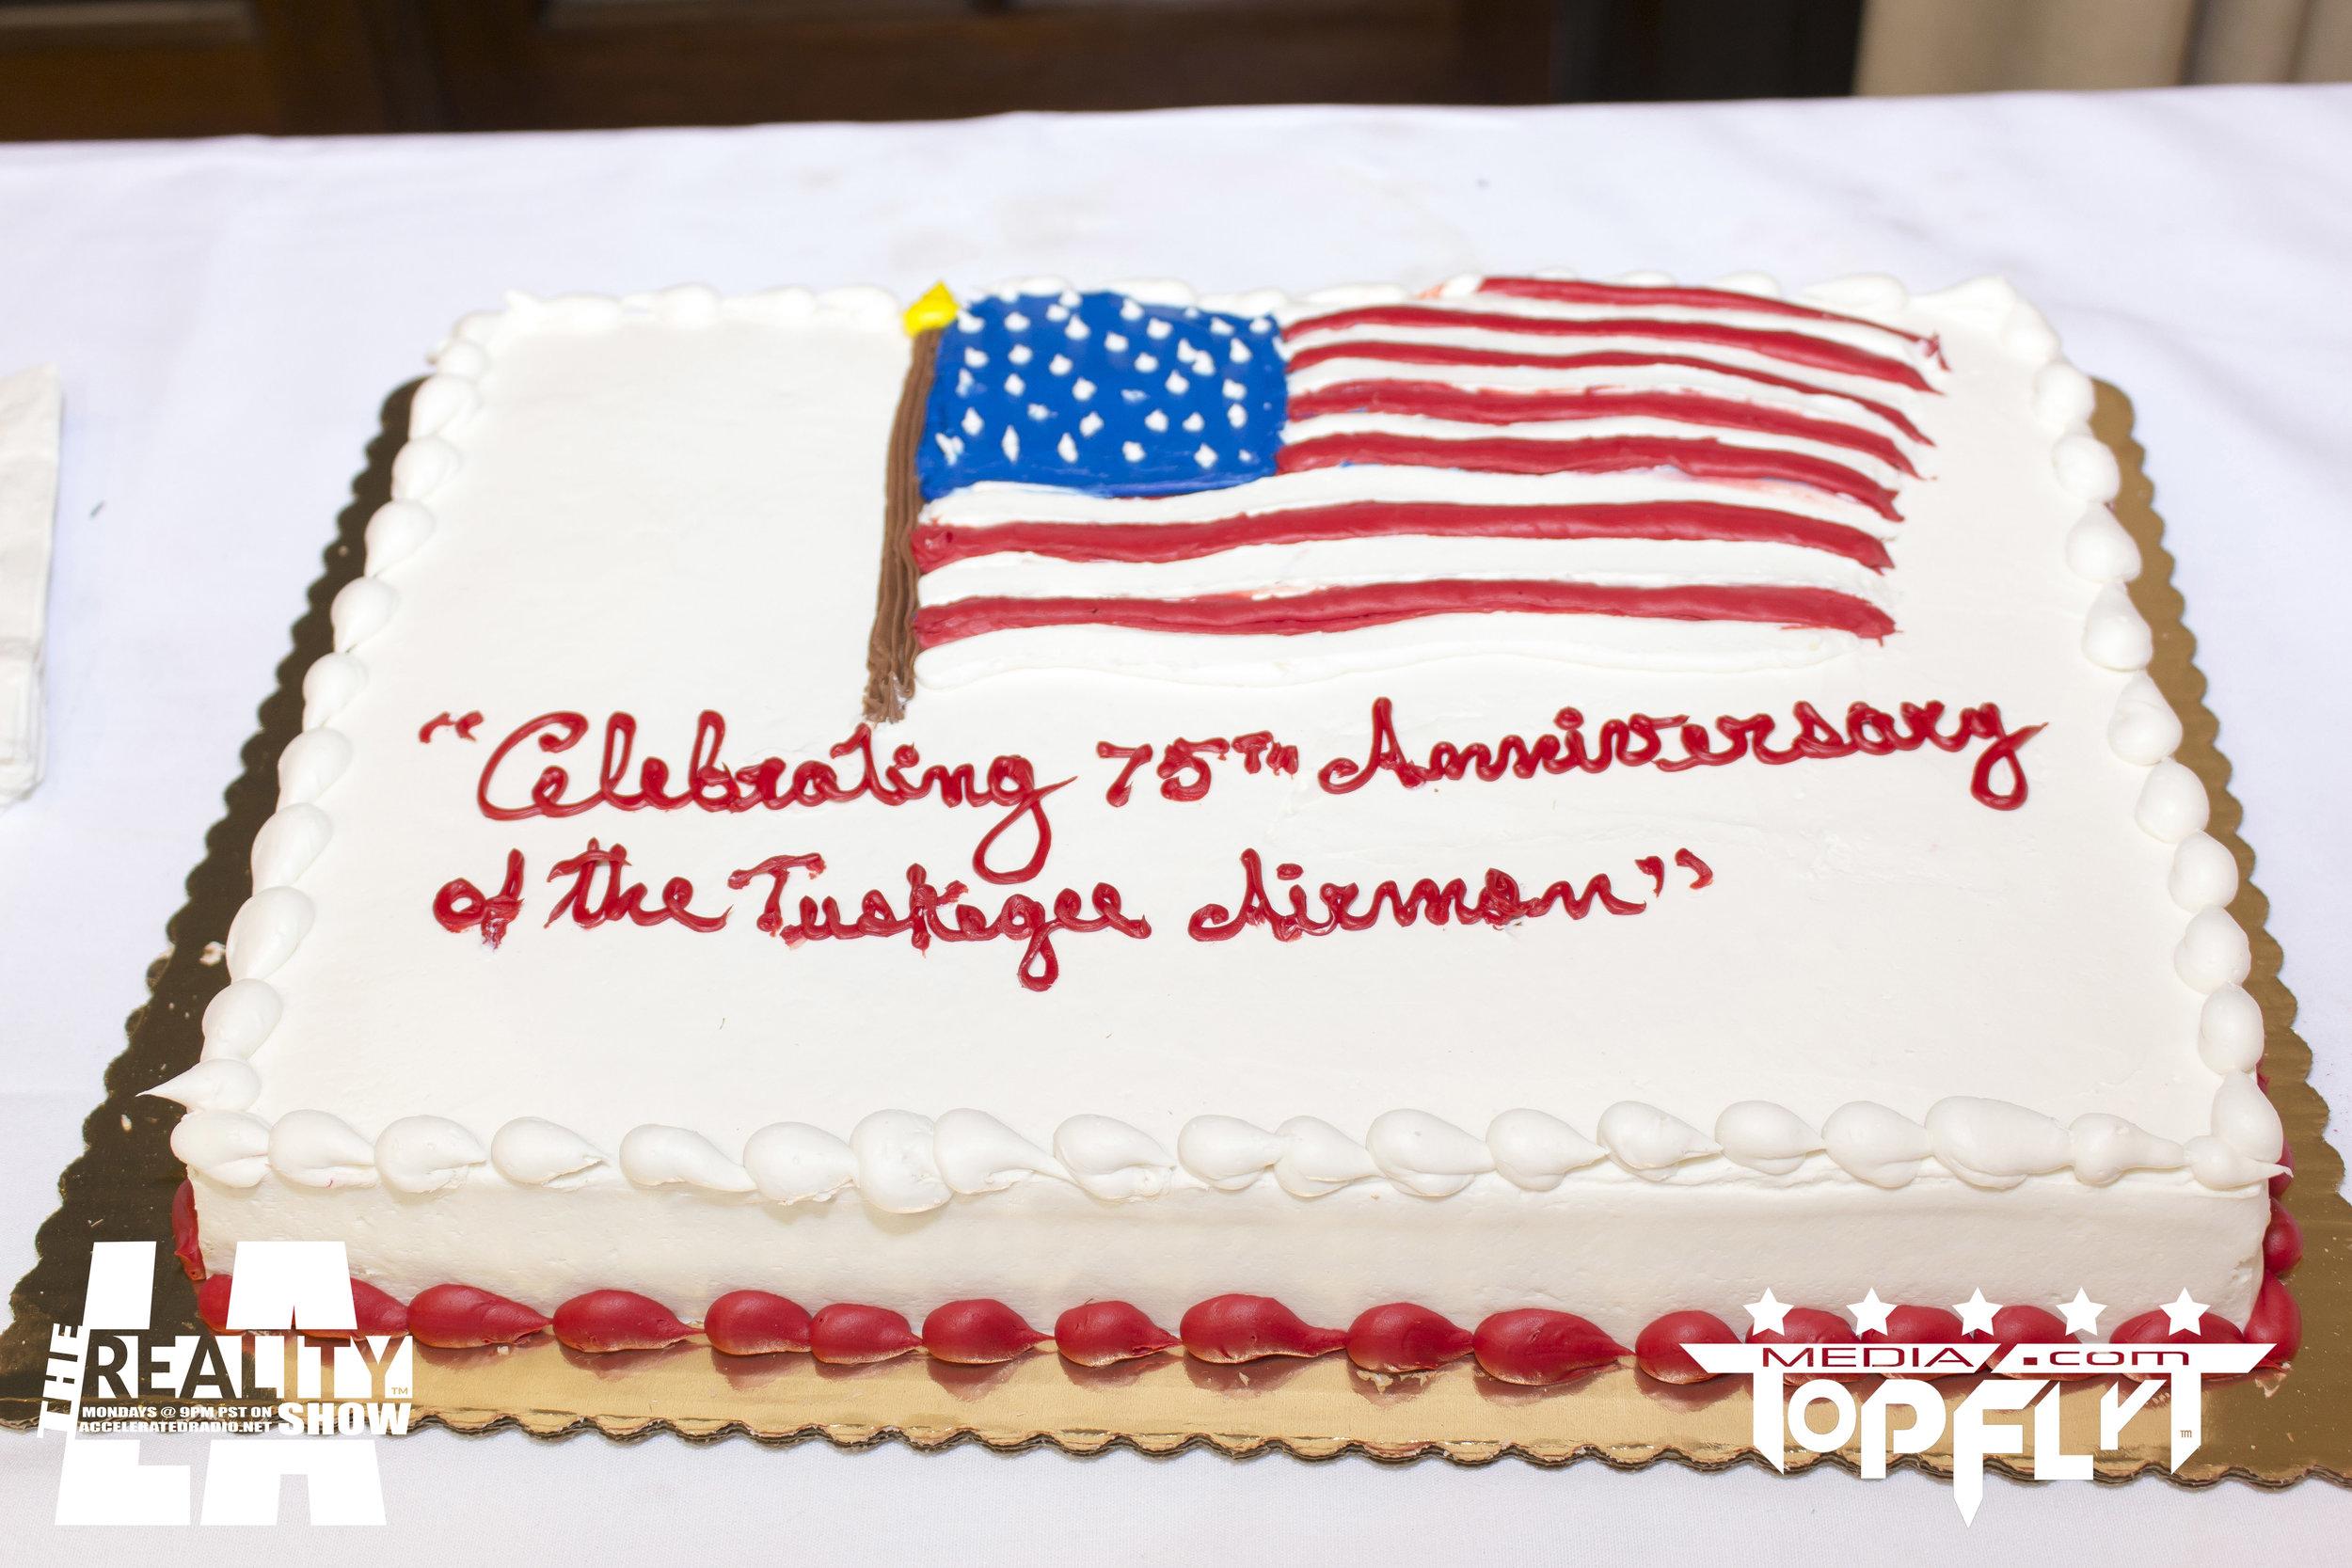 The Reality Show LA - Tuskegee Airmen 75th Anniversary VIP Reception_149.jpg